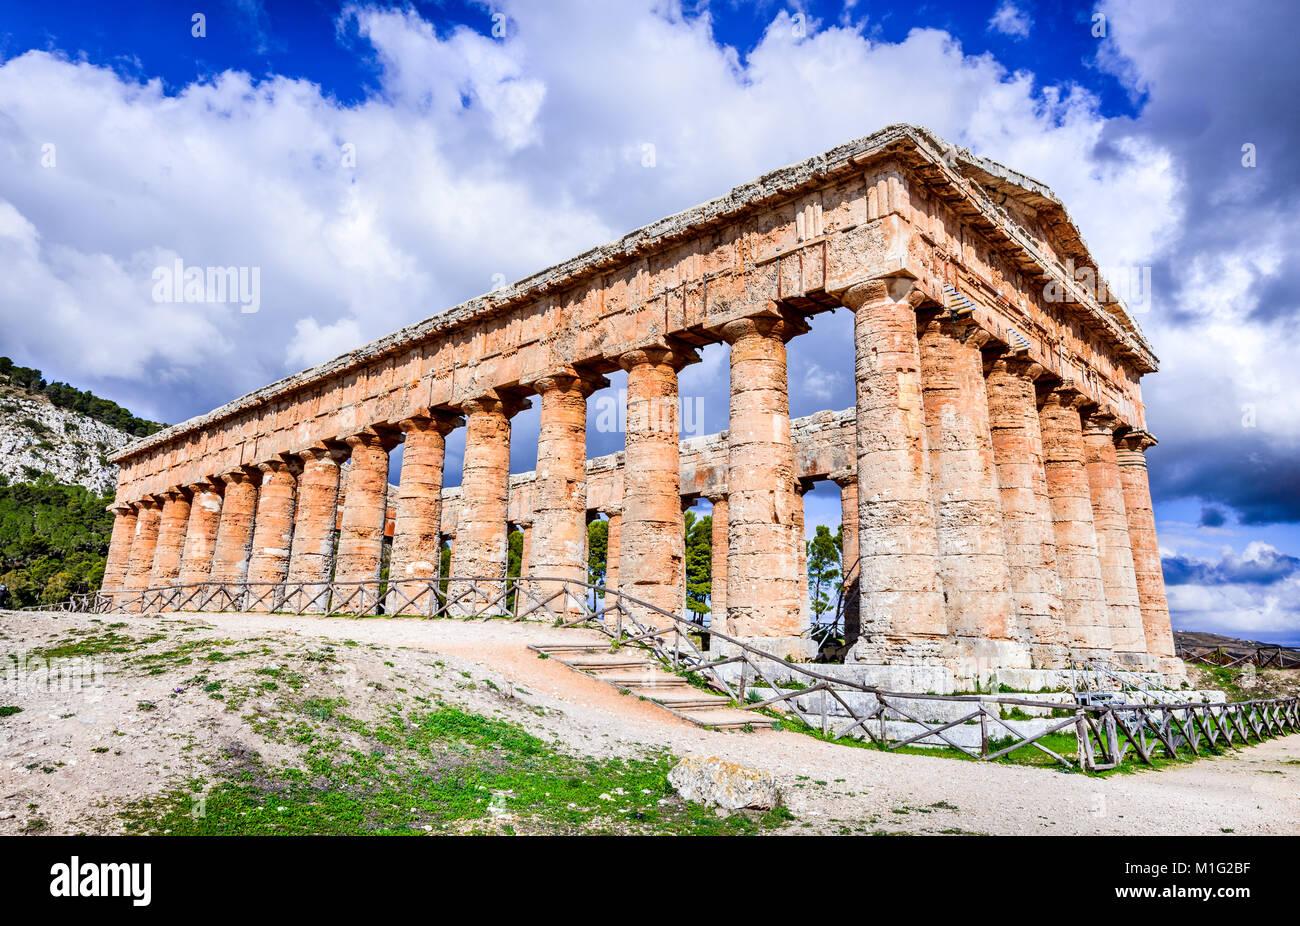 Segesta, Italy. Ancient greek temple of Saegesta, doric architecture in Sicily, Graecia Magna. - Stock Image